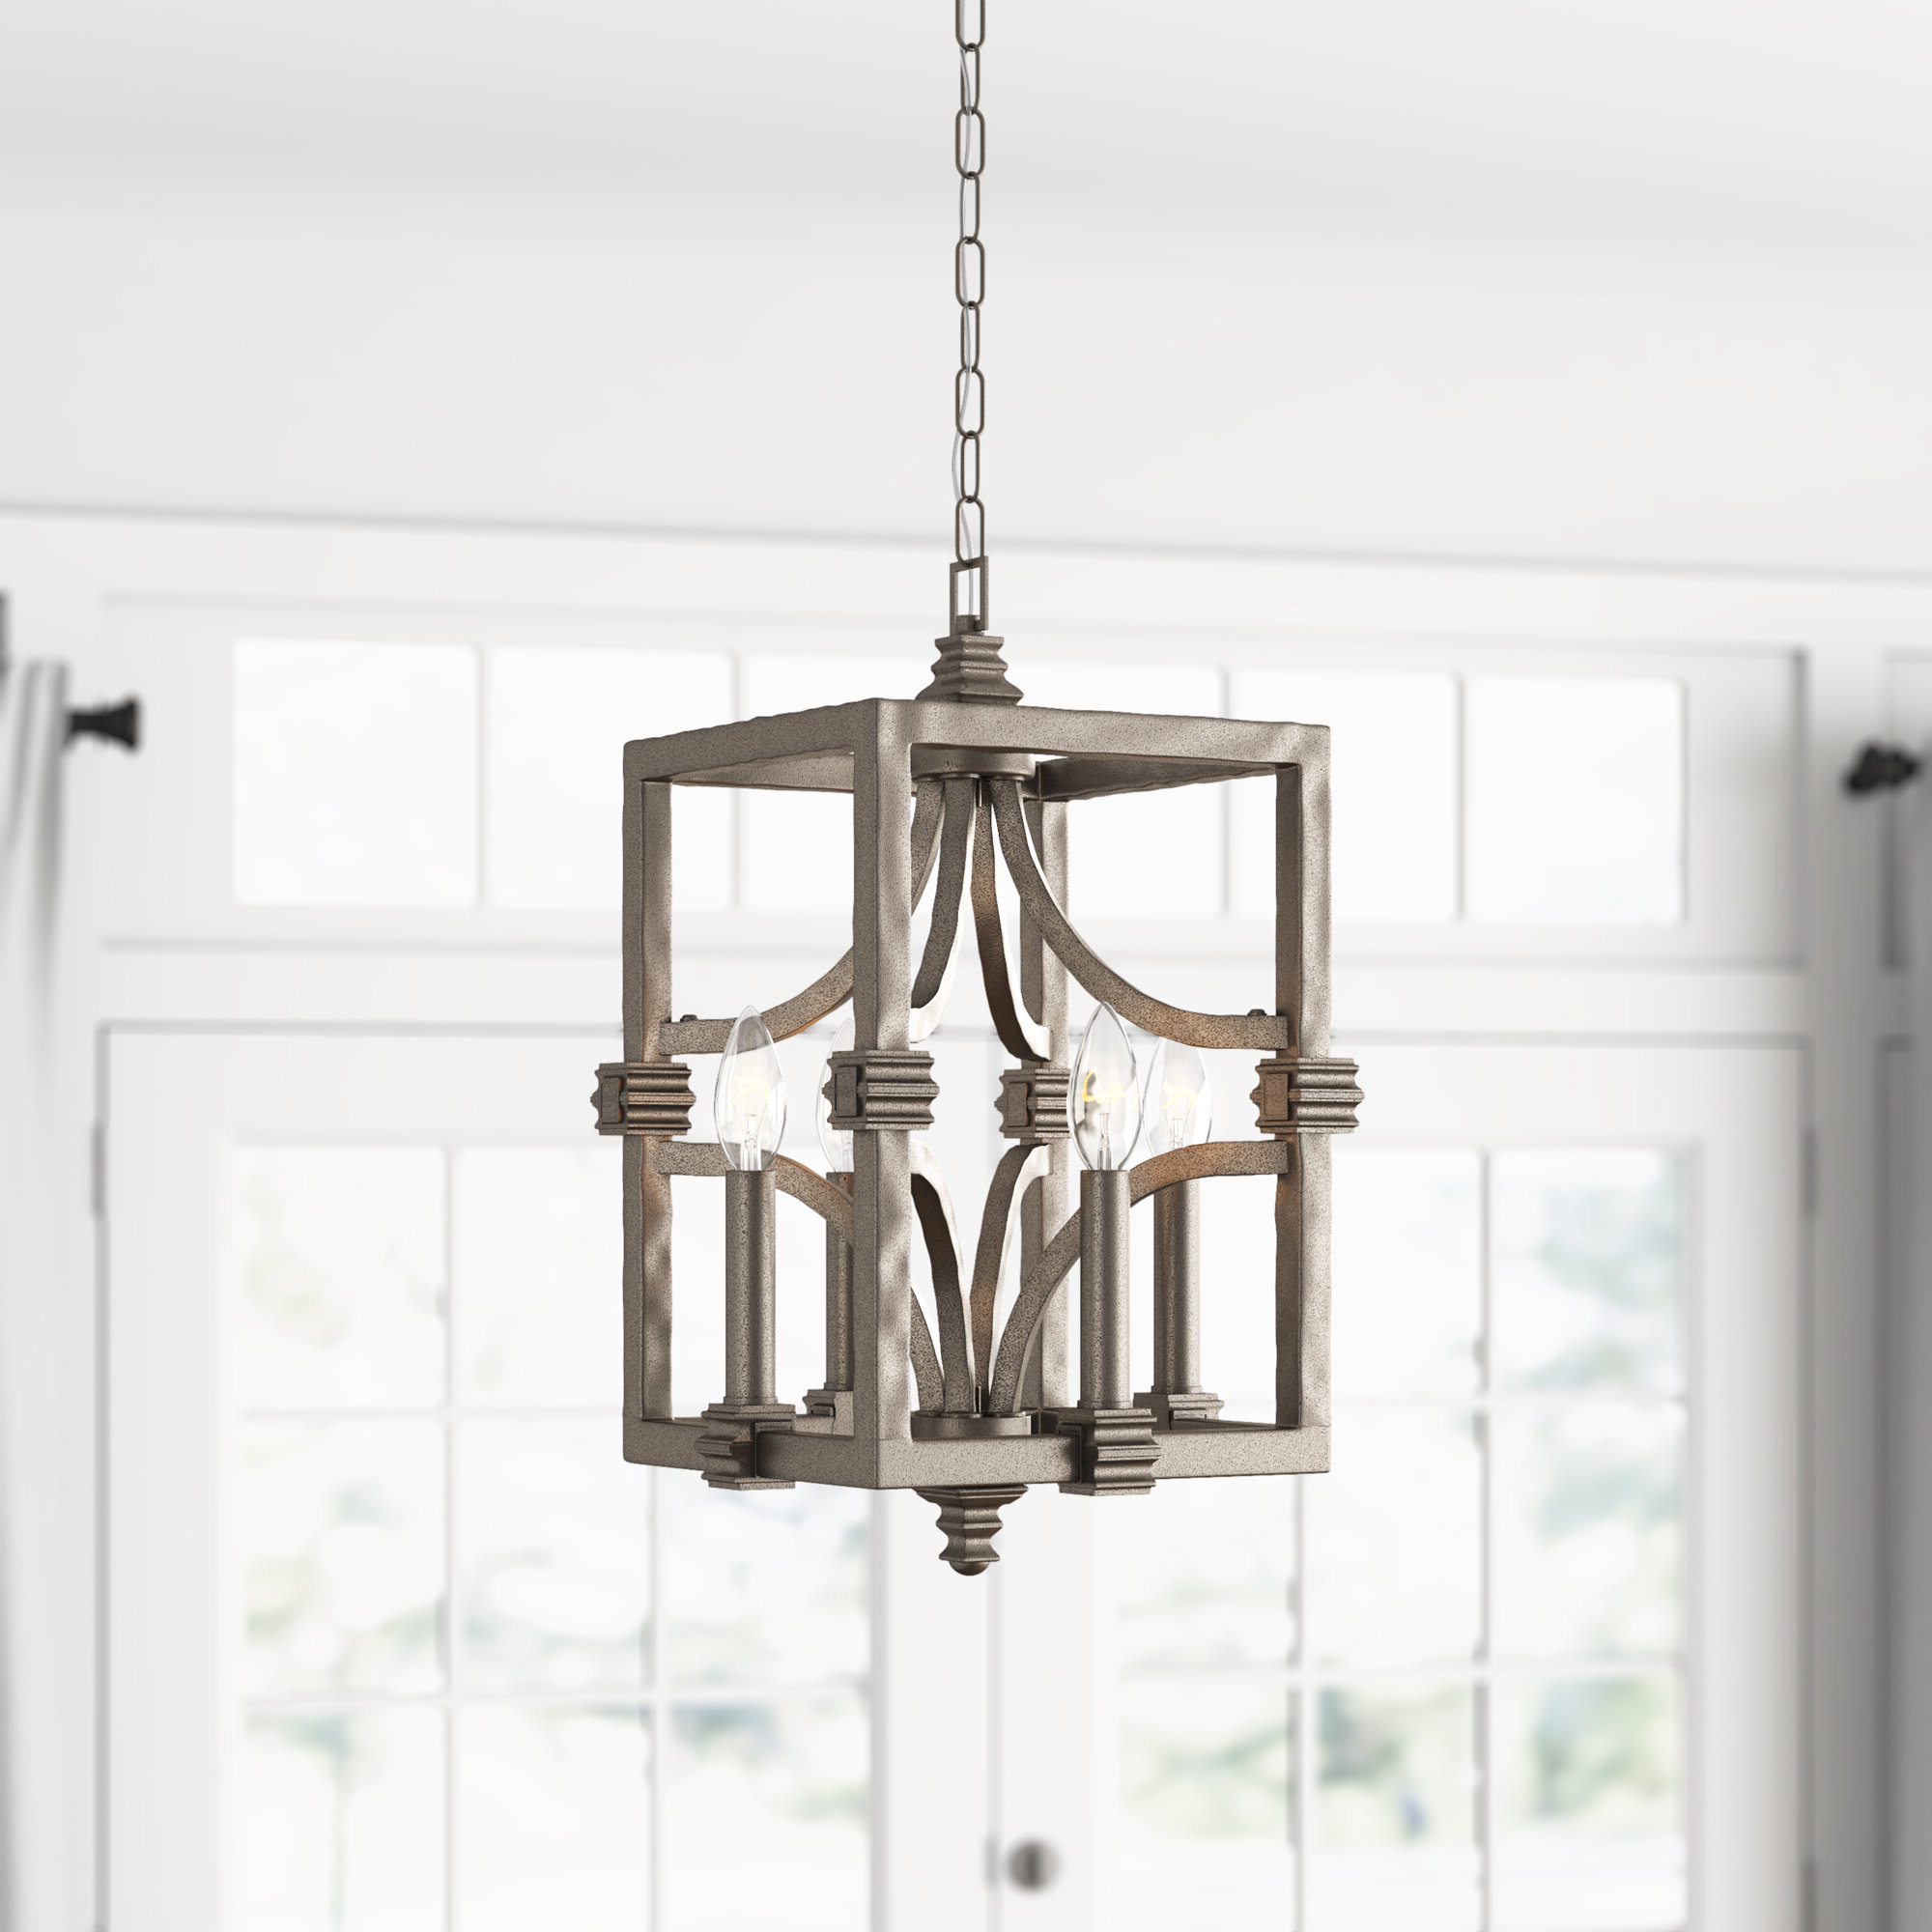 Freeburg 4 Light Lantern Square / Rectangle Pendant Throughout Famous Armande 4 Light Lantern Drum Pendants (View 11 of 25)